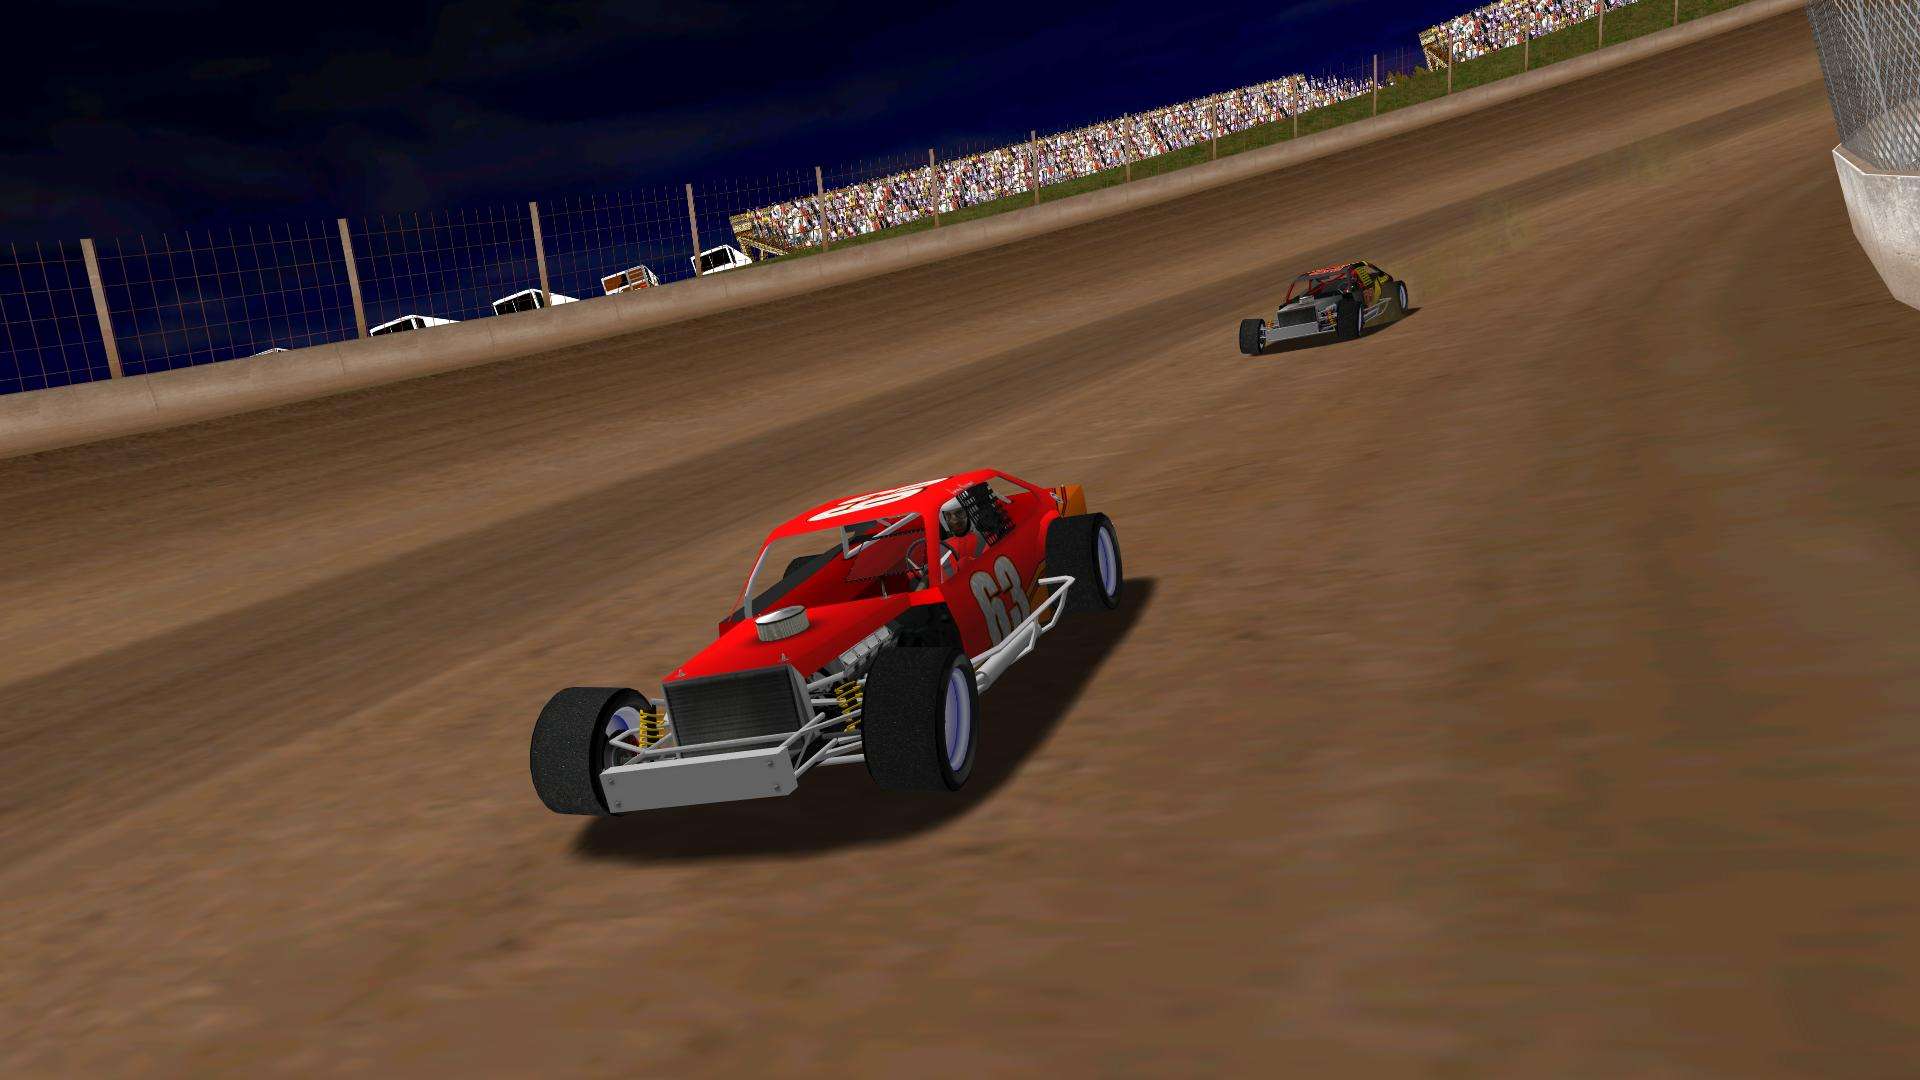 KartRacer63 leading BlackKnight through turn two. (NHMA)